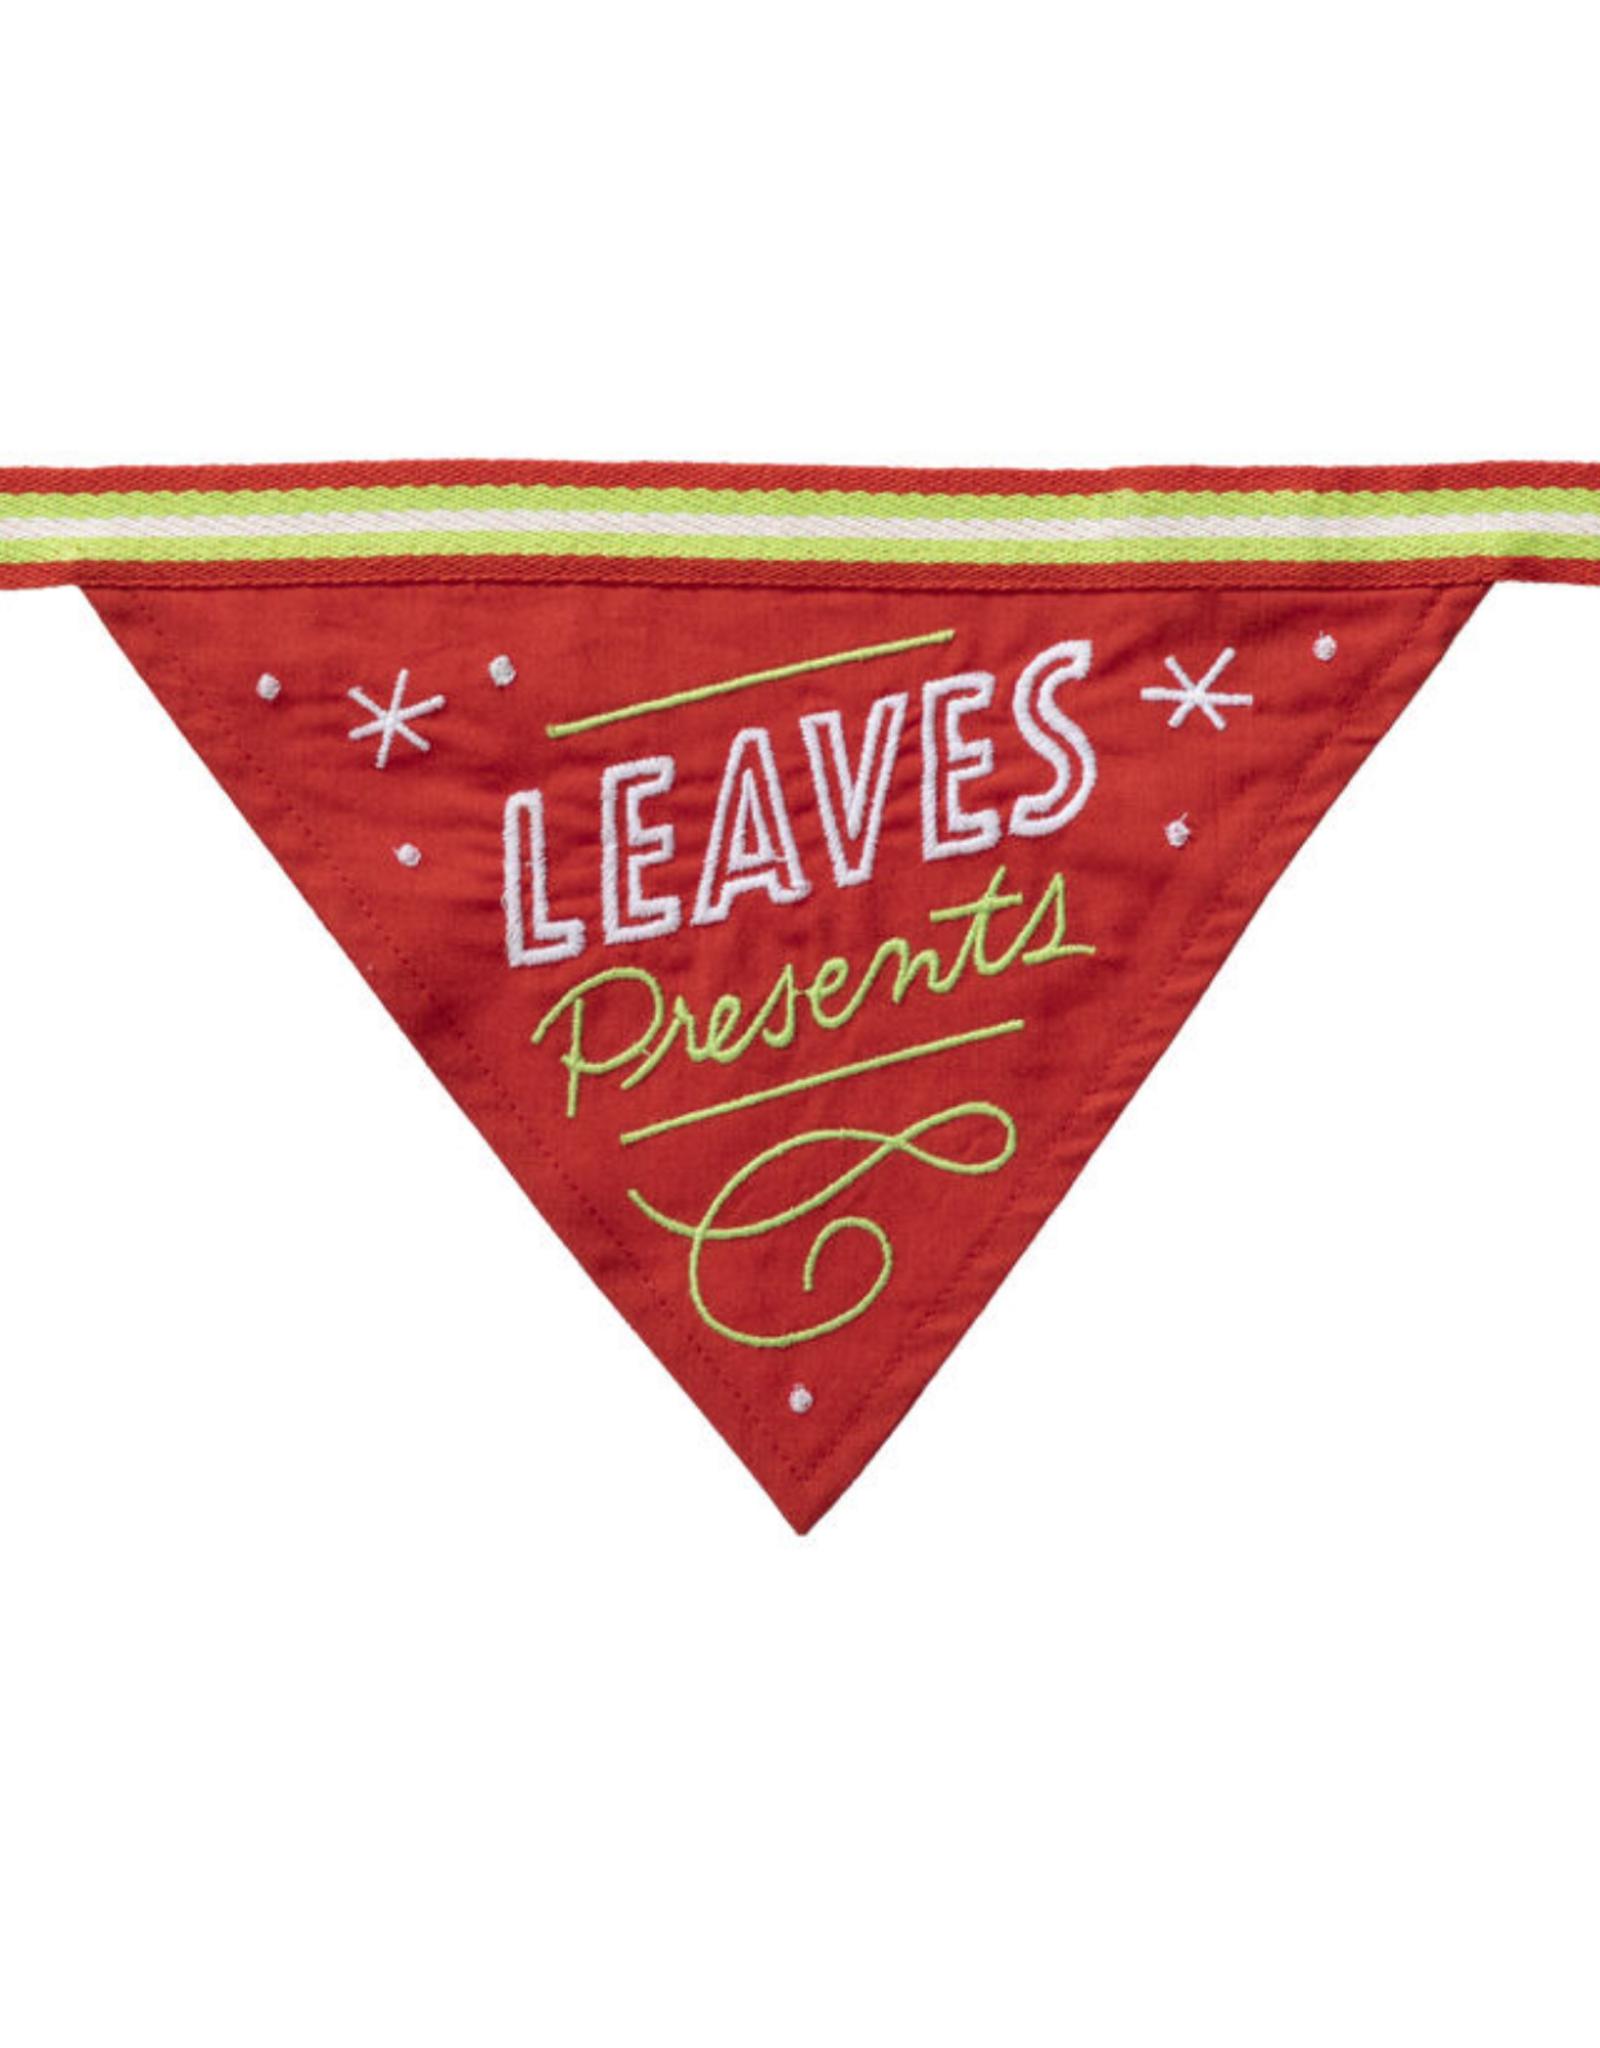 Leaves Presents Dog Bandana